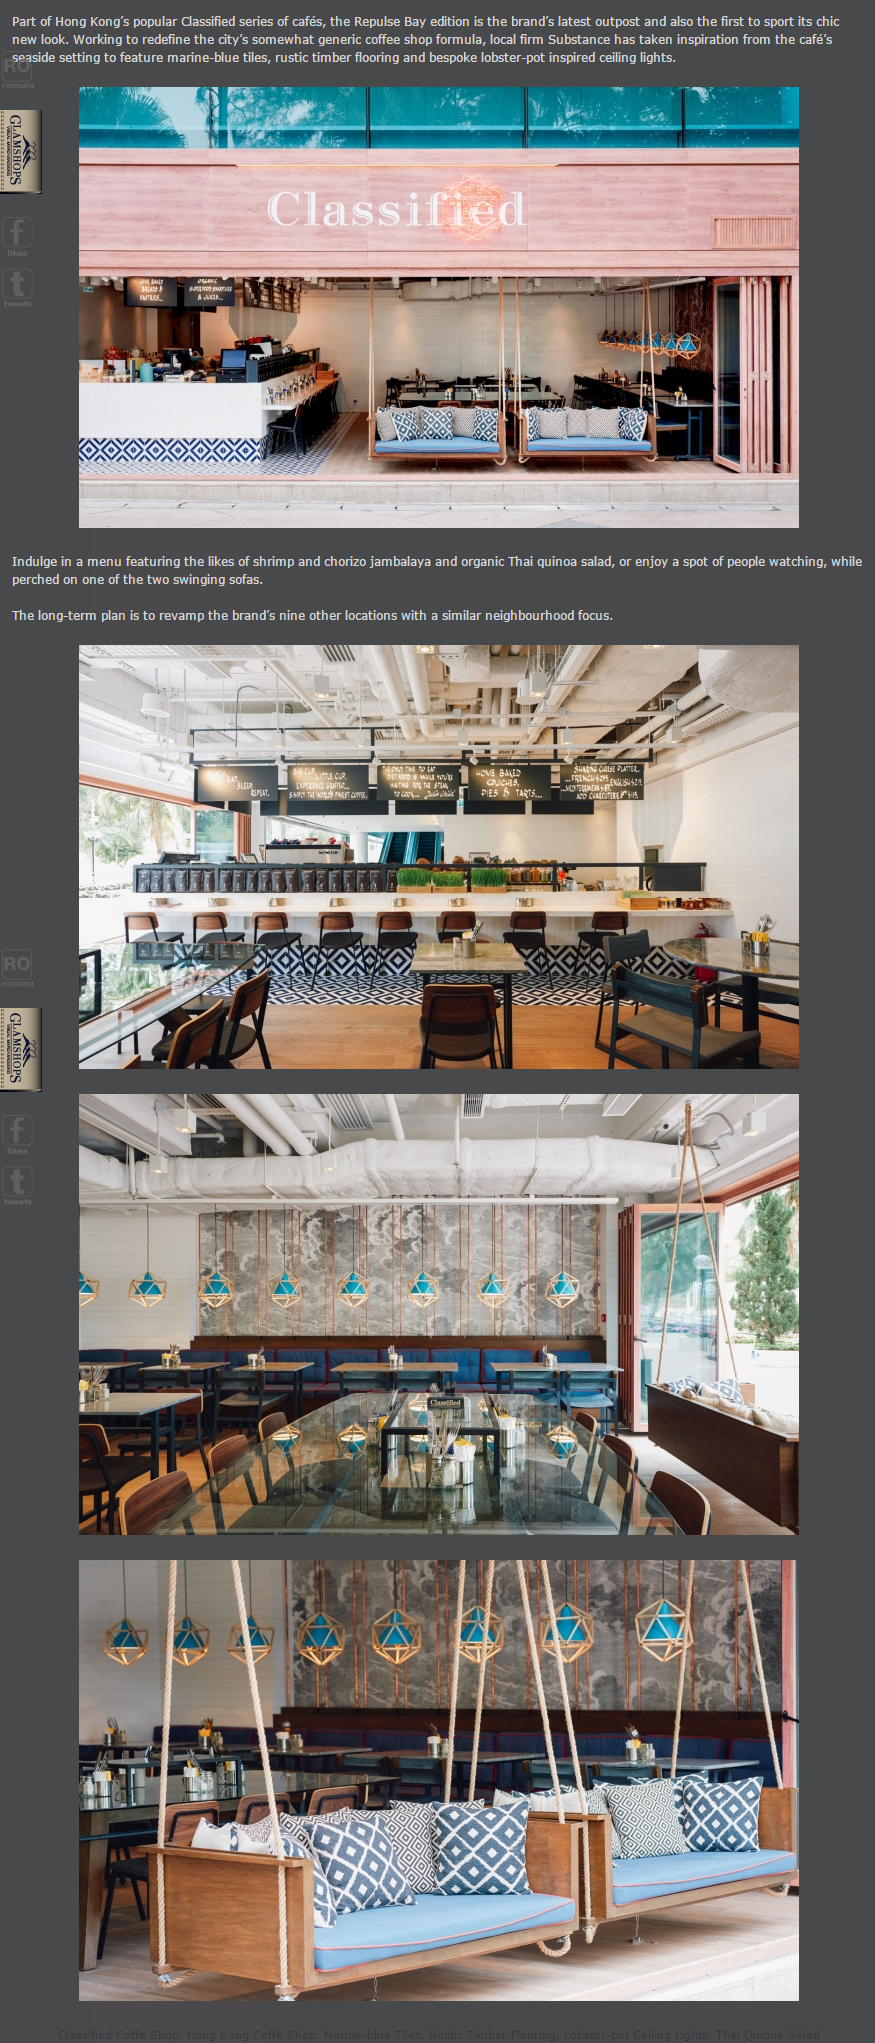 http   www.glamshops.ro shop-review-classified-coffee-shop-in-hong ... eb432074aa8